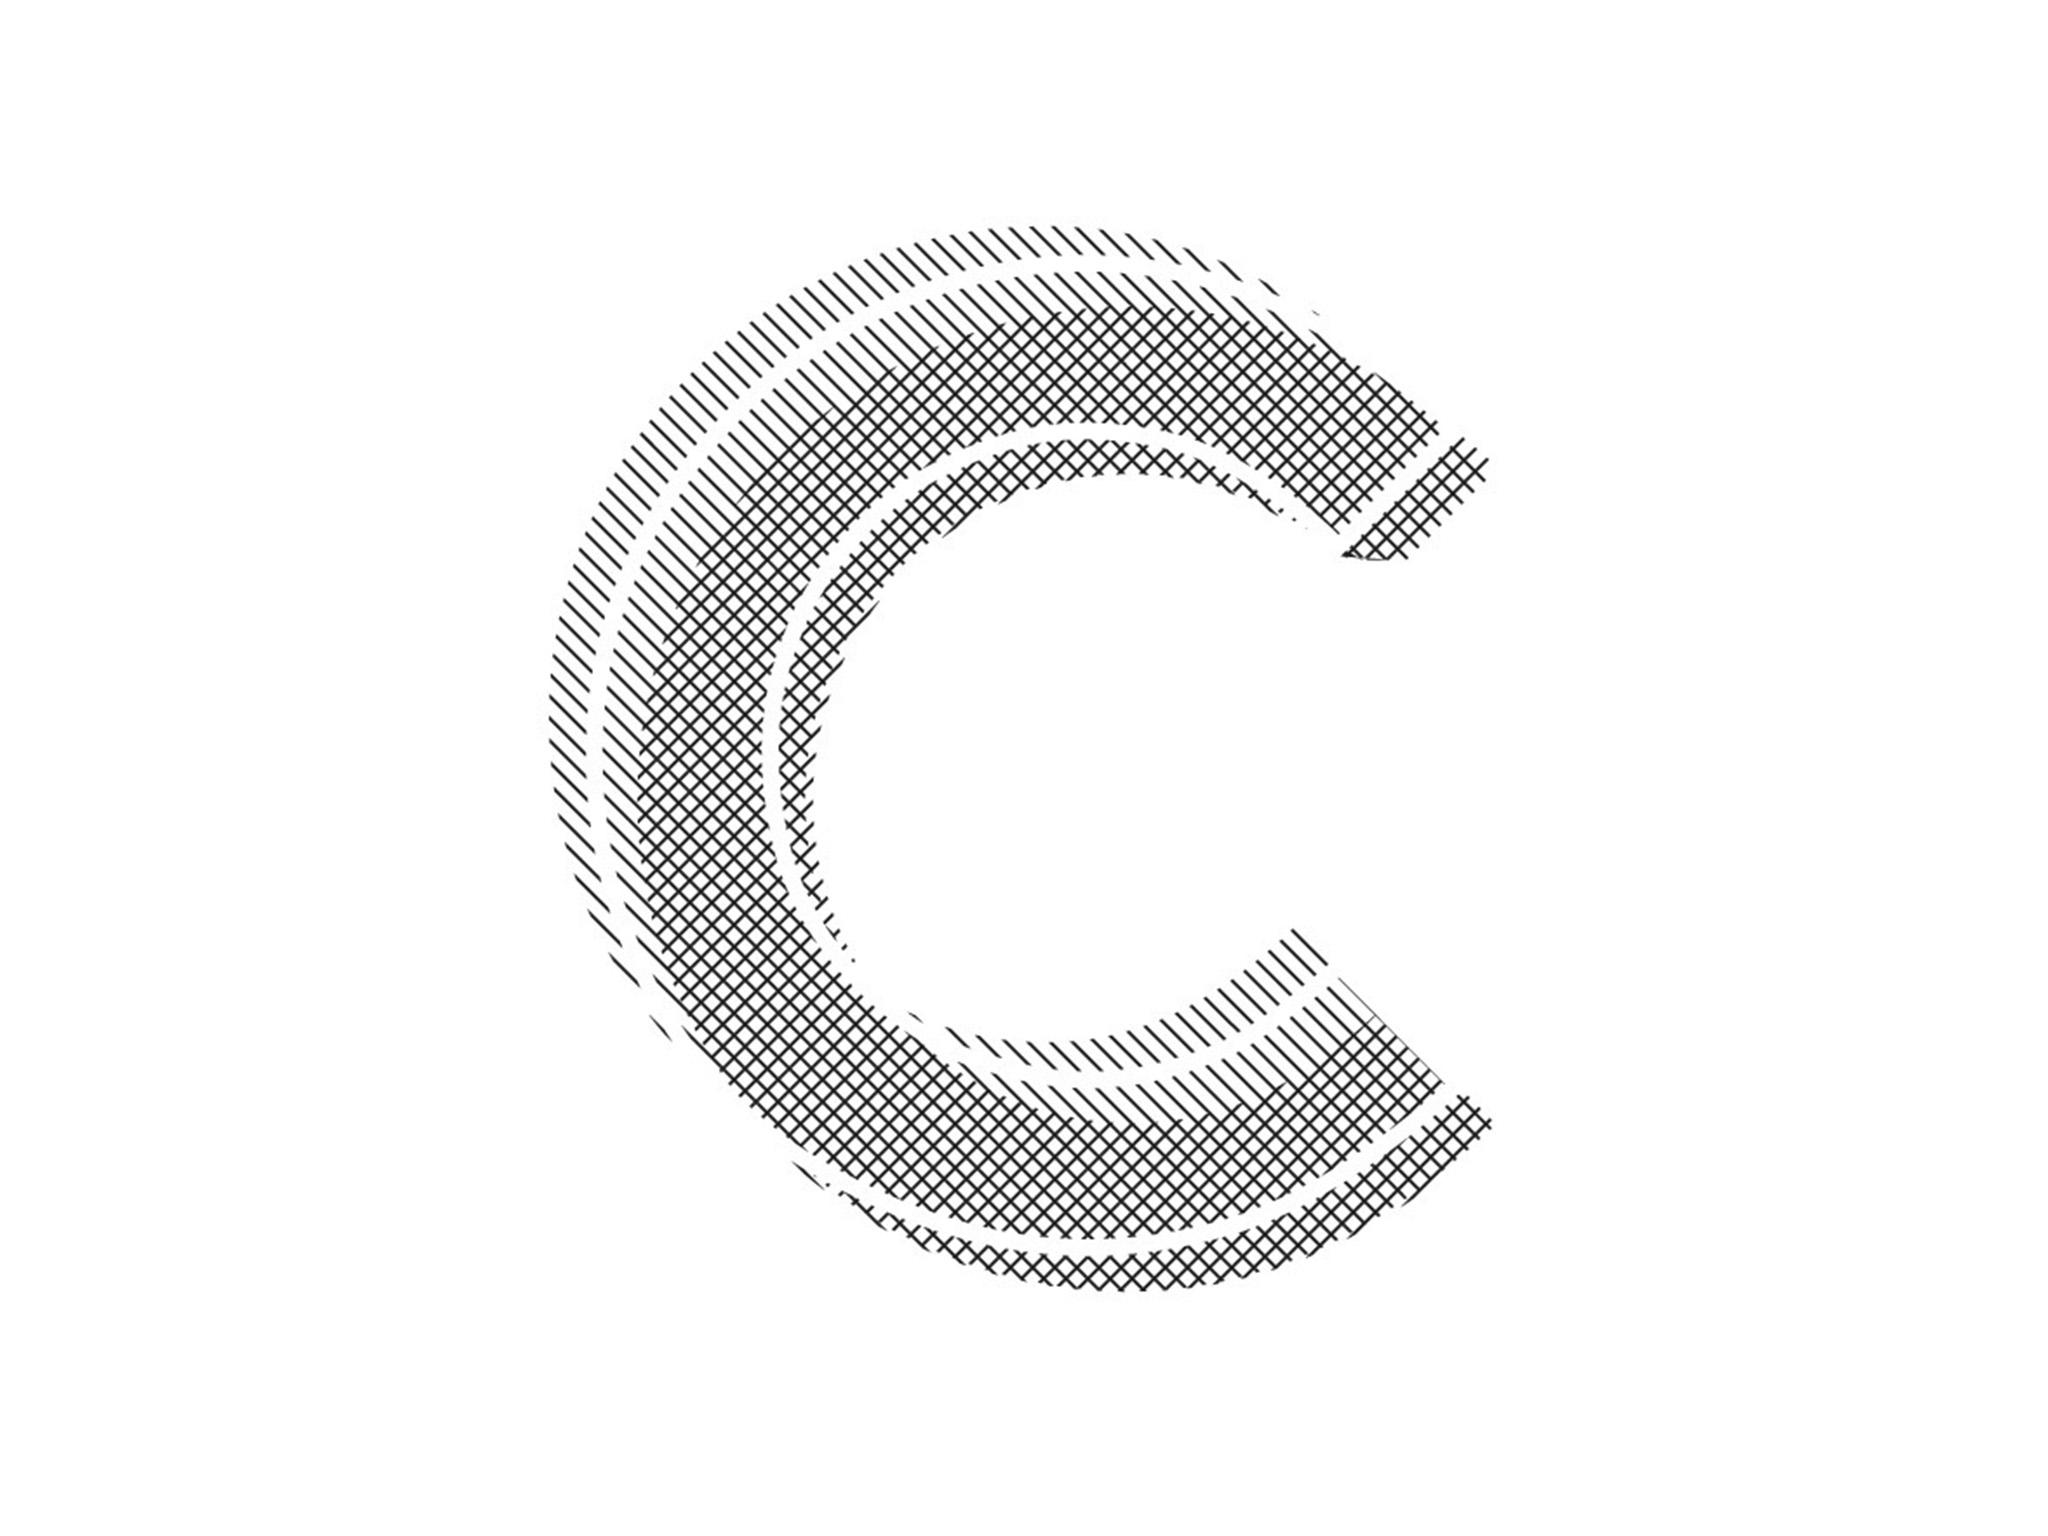 apex_letters_horizontal_large_0019_2_final_alphabet coasters-03.jpg